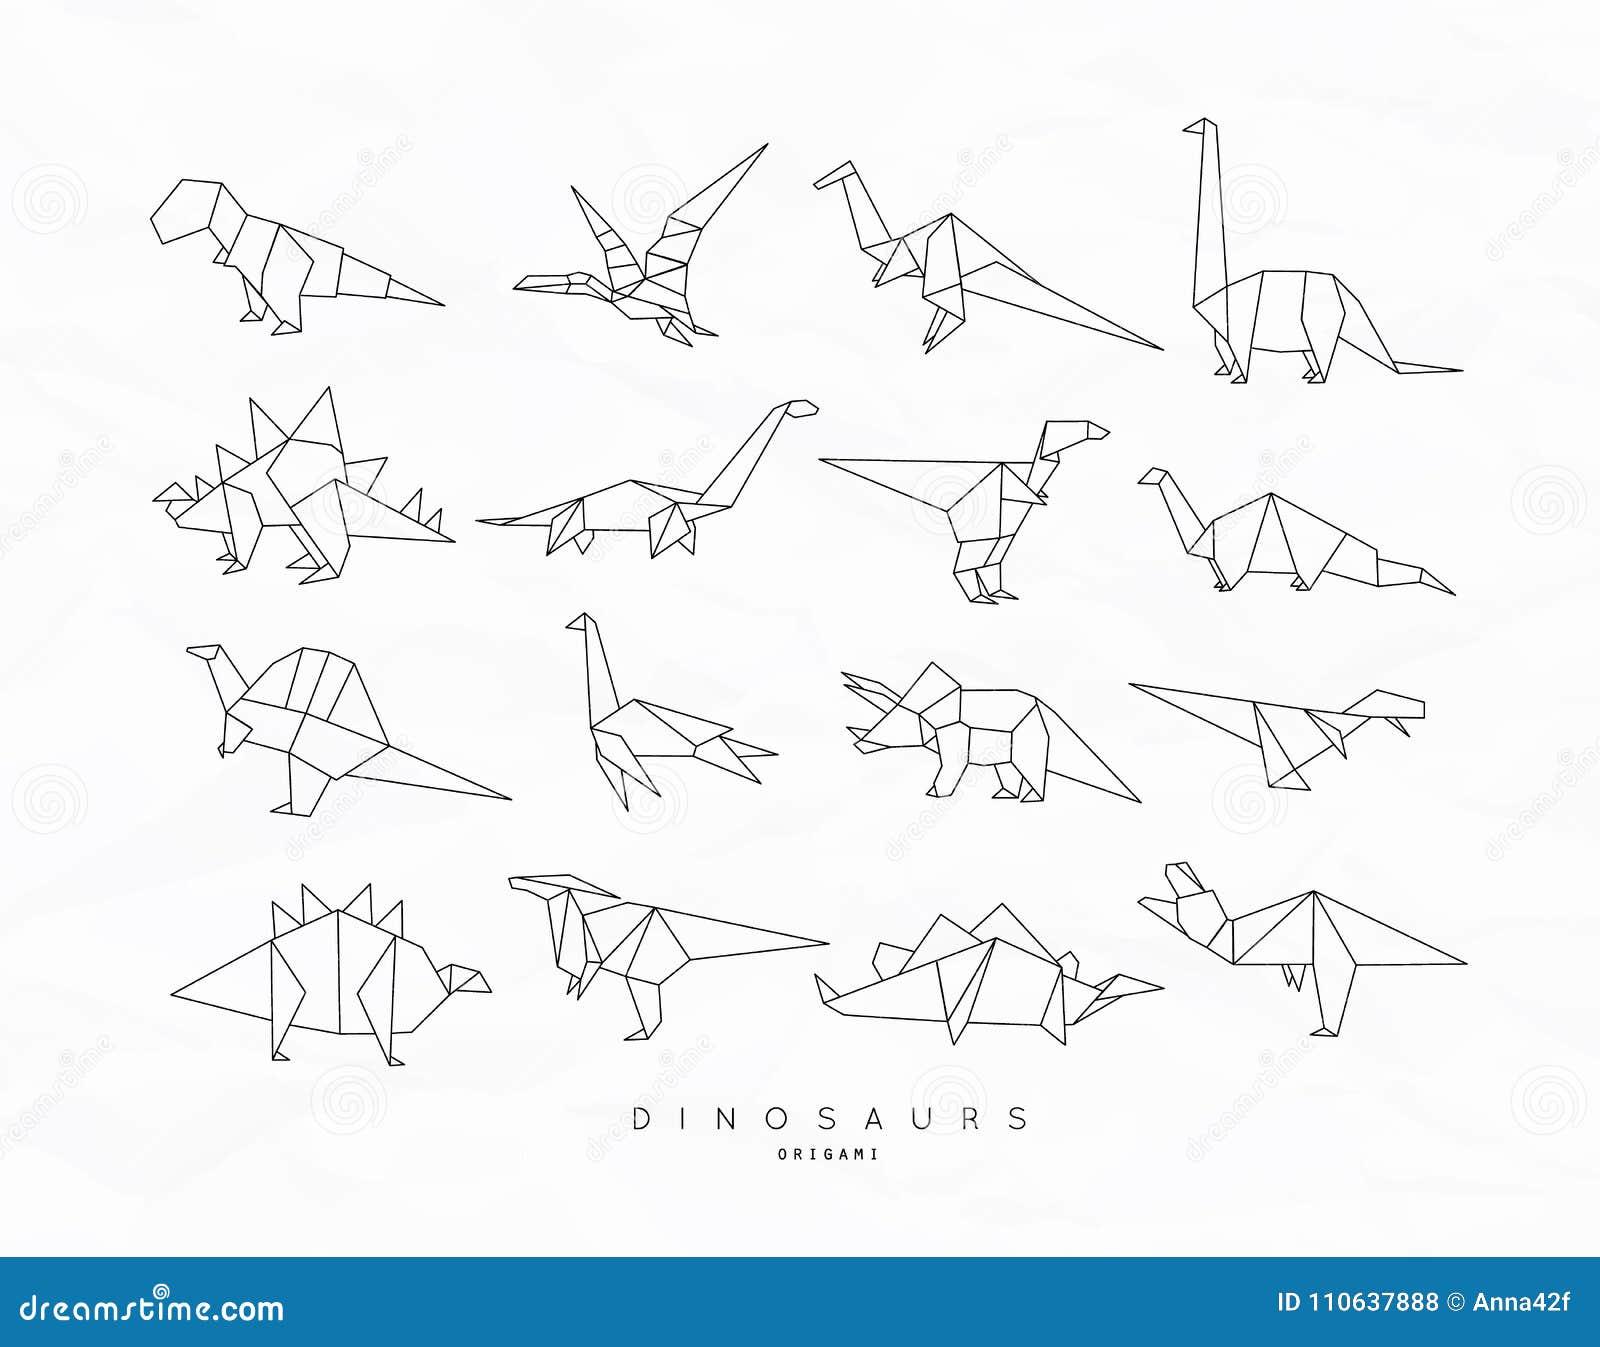 Stegosaurus Origami Diagram Electrical Wiring Diagrams Dinosaurs A List Of Online Origamidinosaur Dinosaurus Set Flat Stock Vector Illustration Jurassic Lion In